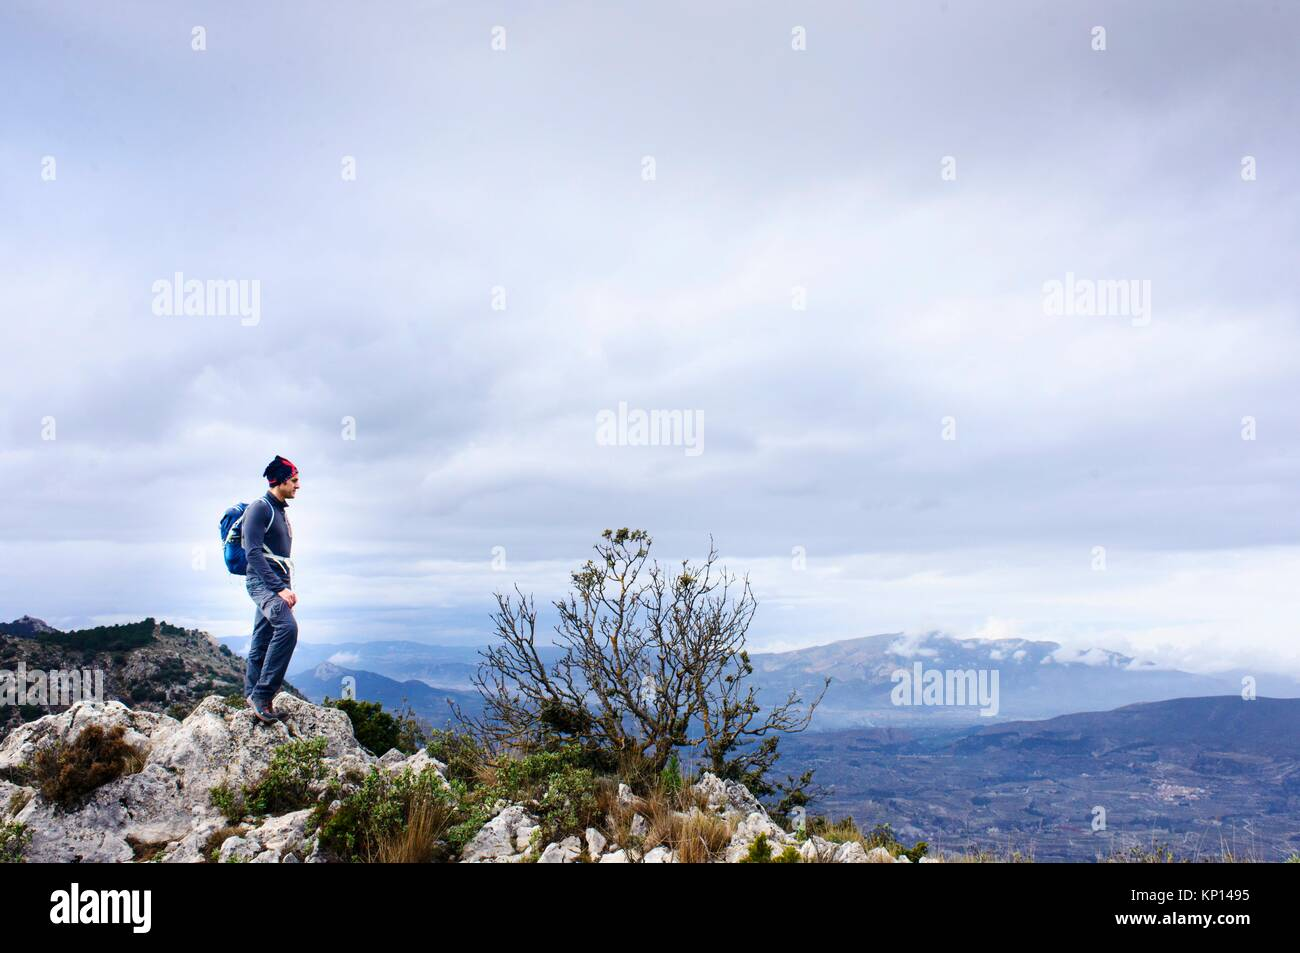 ountaineer on top of the mountain in Quatretondeta, Alicante, Valencia, Spain - Stock Image